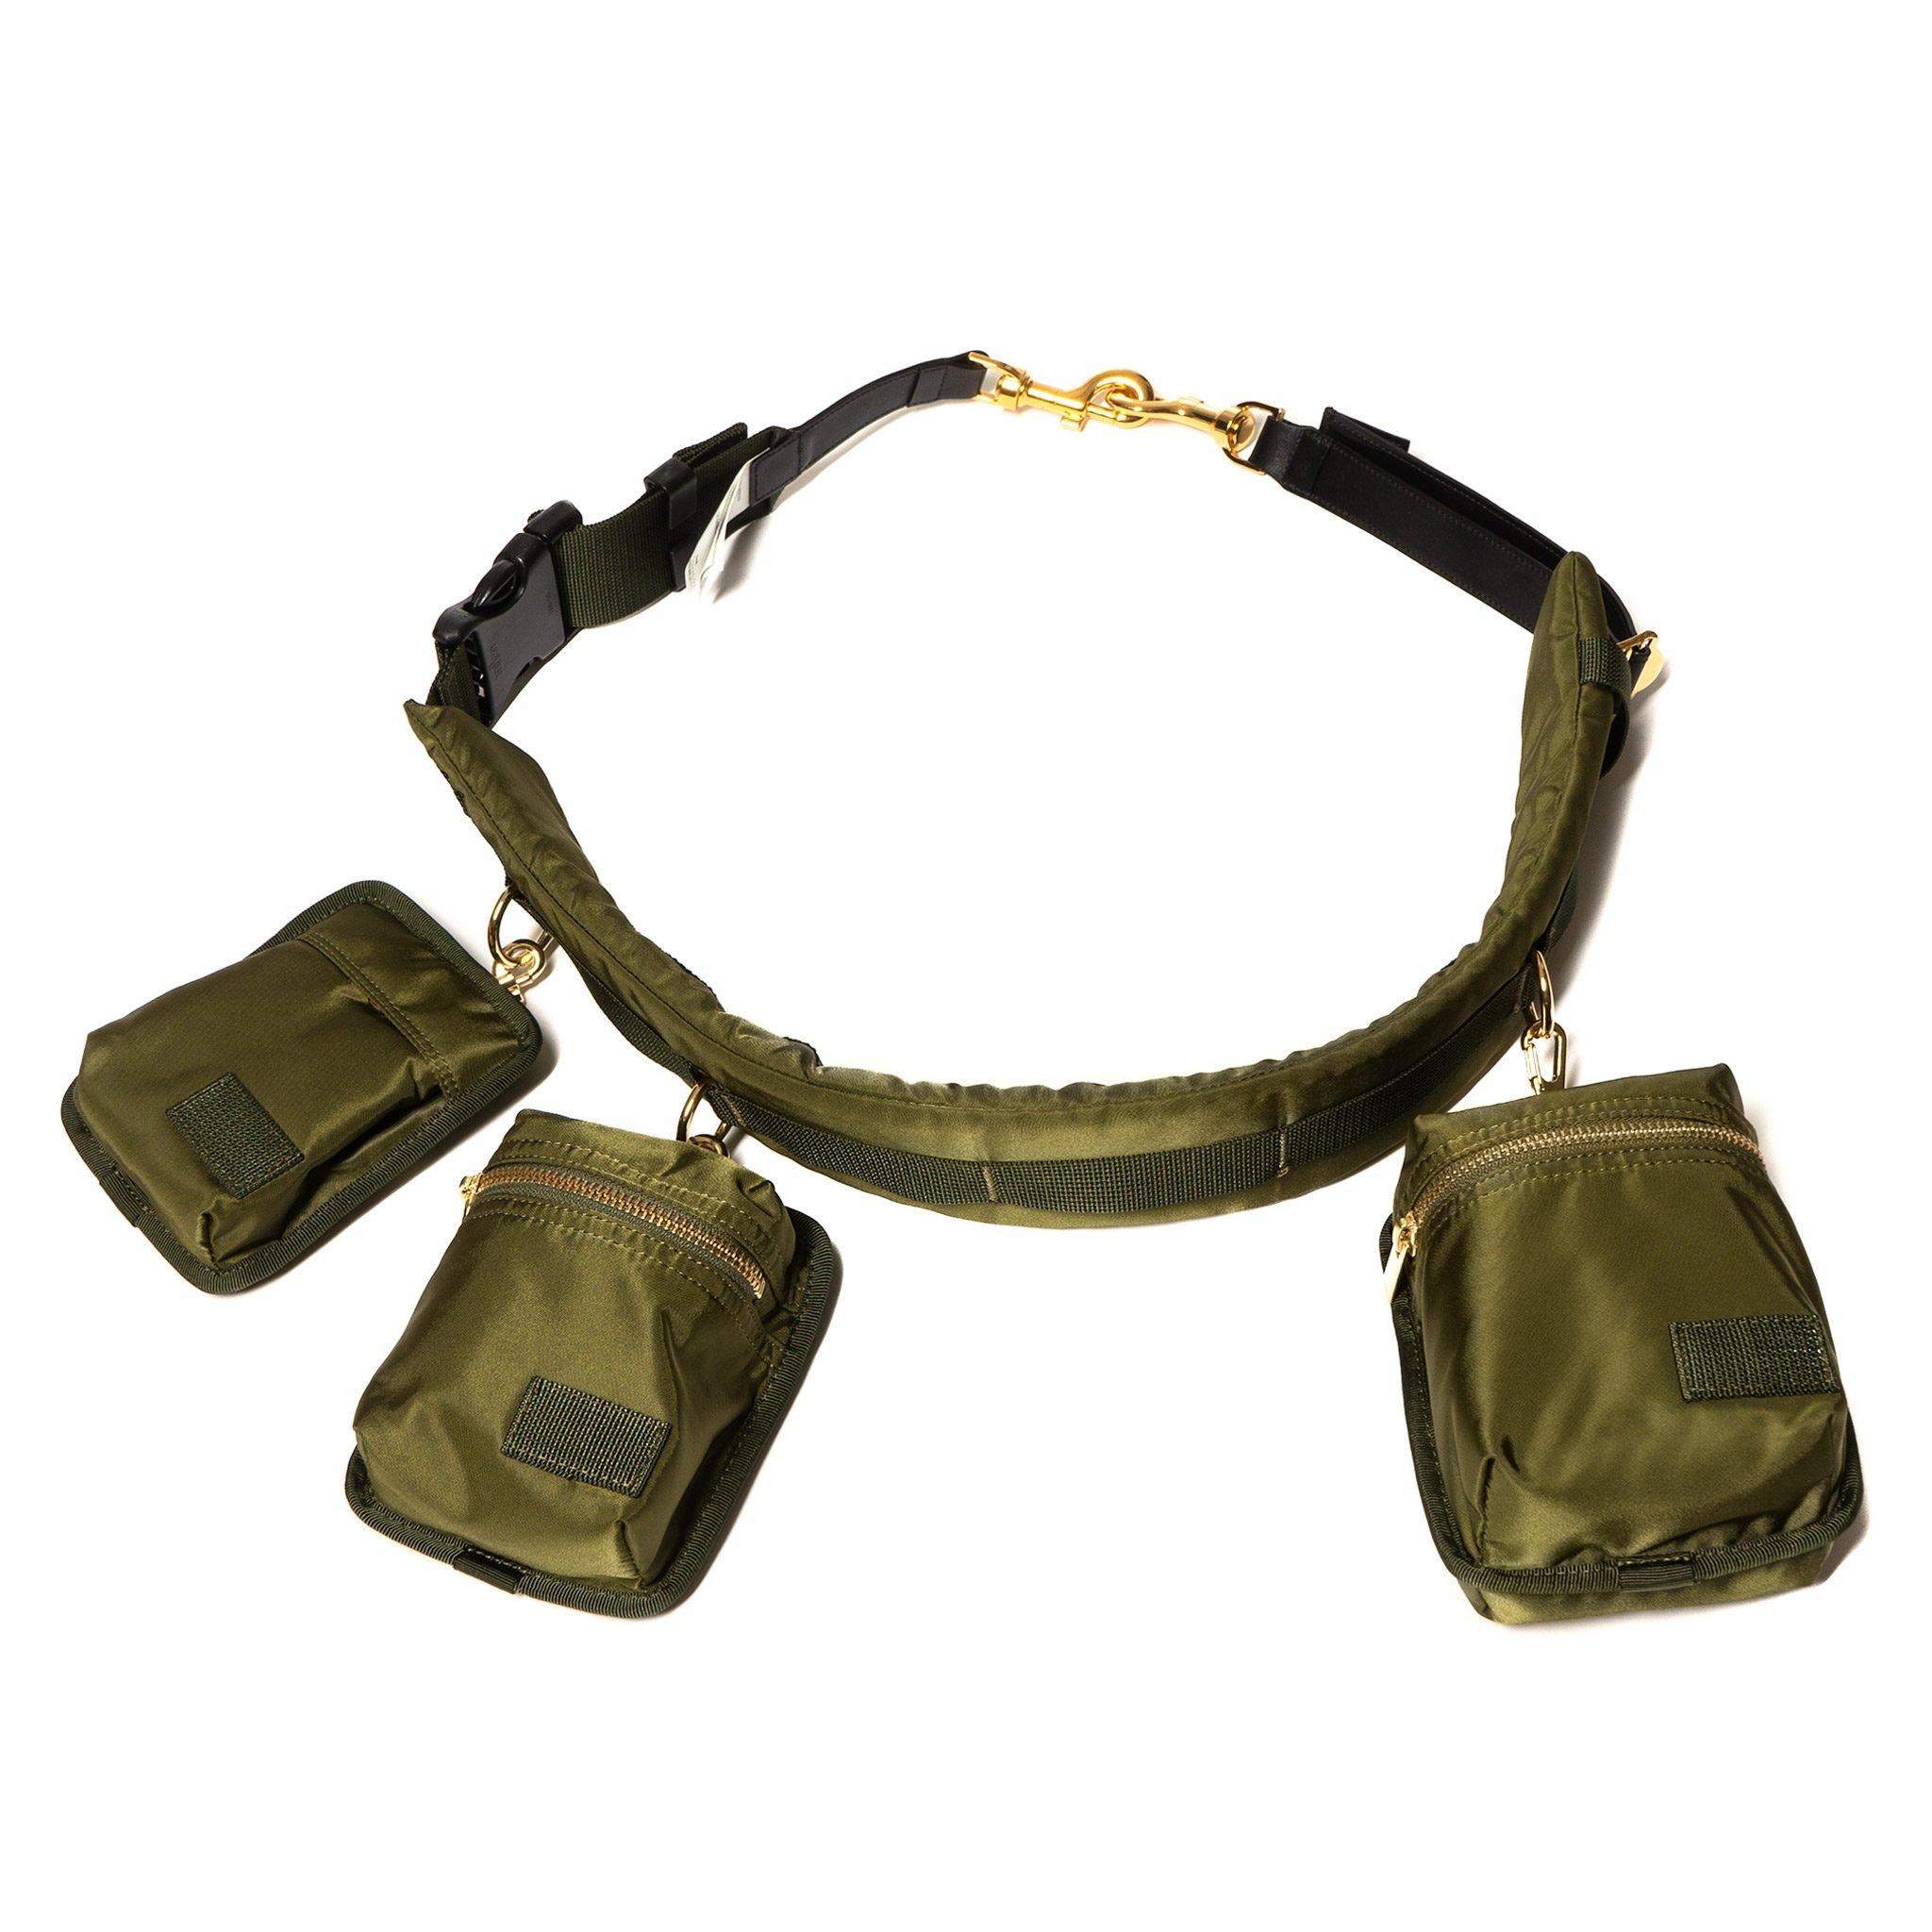 HAVEN-Sacai-Belt-Bag-Khaki-1_2048x2048.progressive.jpg